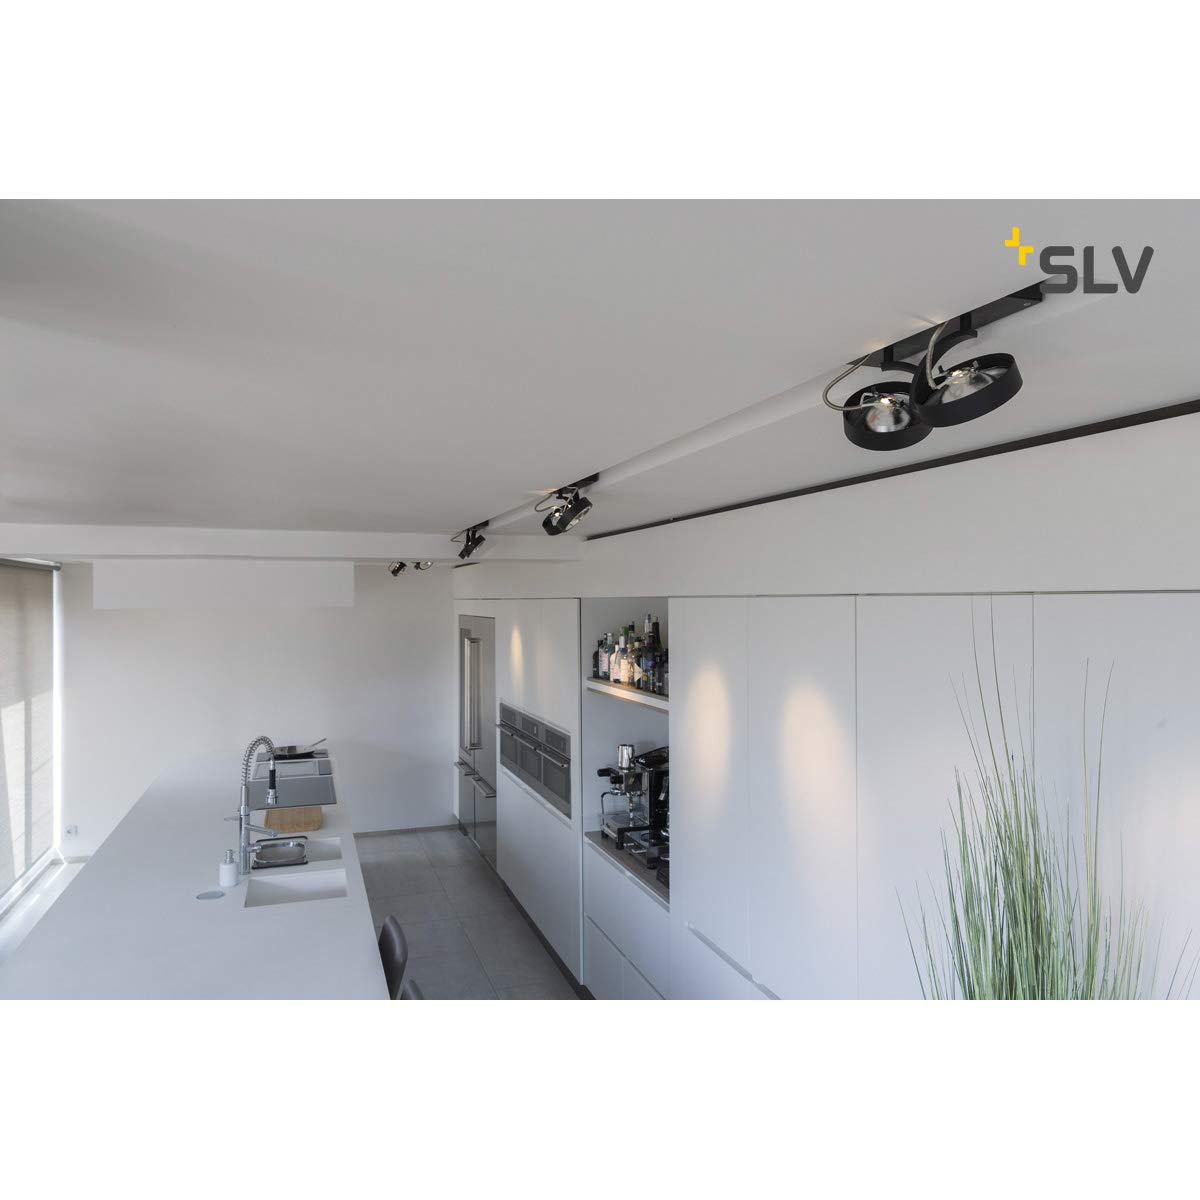 G53 230volts 2 Strahler blanc mat Luminaire mural et plafonnier SLV Aluminium